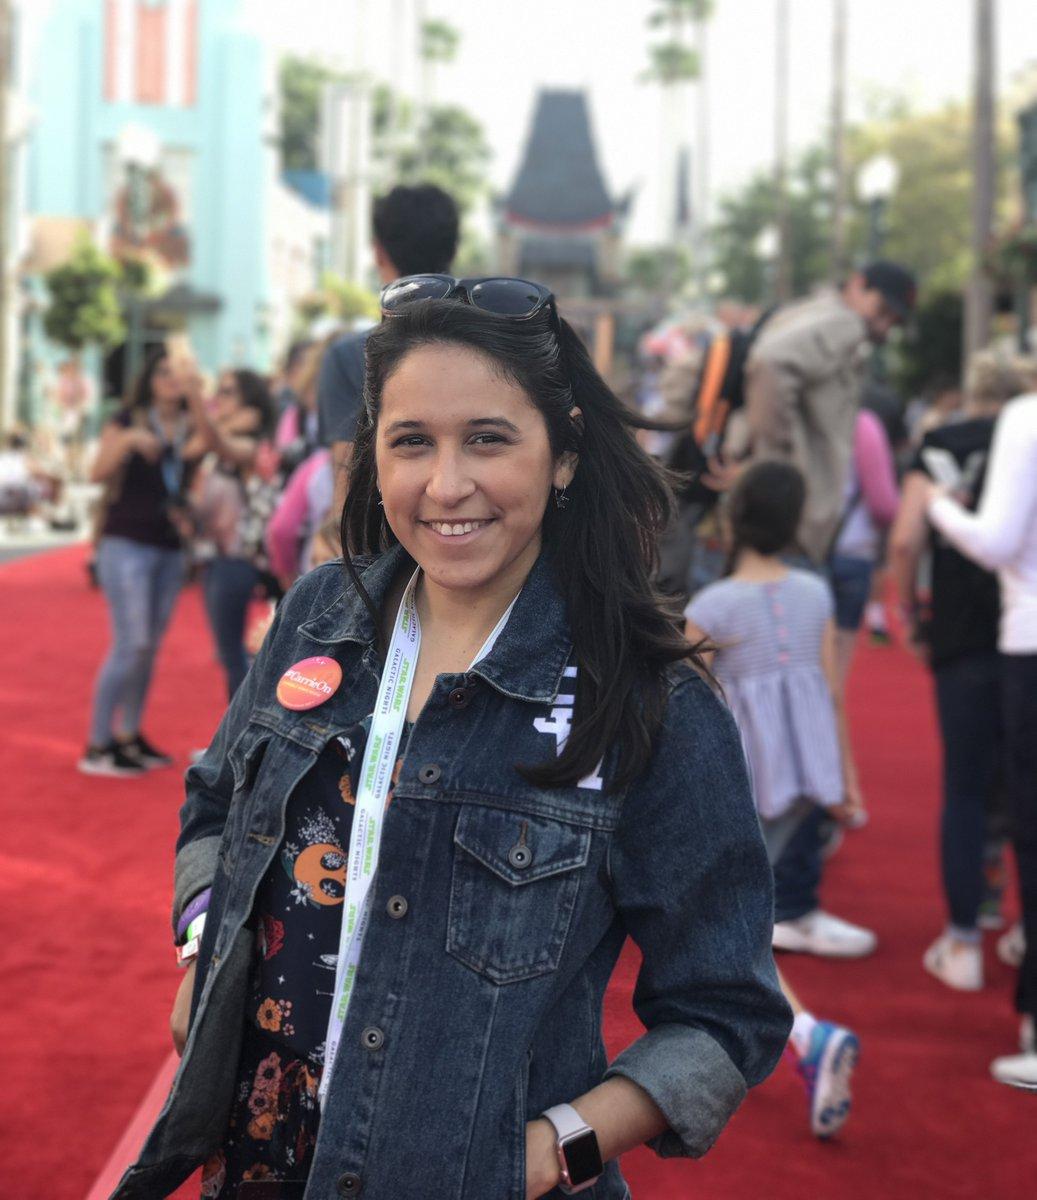 Meet Teresa Delgado, a Fangirl Who Turned Her Love of #StarWars Into a Podcast Empire #SWCO  http:// remezcla.com/features/film/ teresa-delgado-latina-podcast-star-wars/ &nbsp; … <br>http://pic.twitter.com/6nHohBmPwh